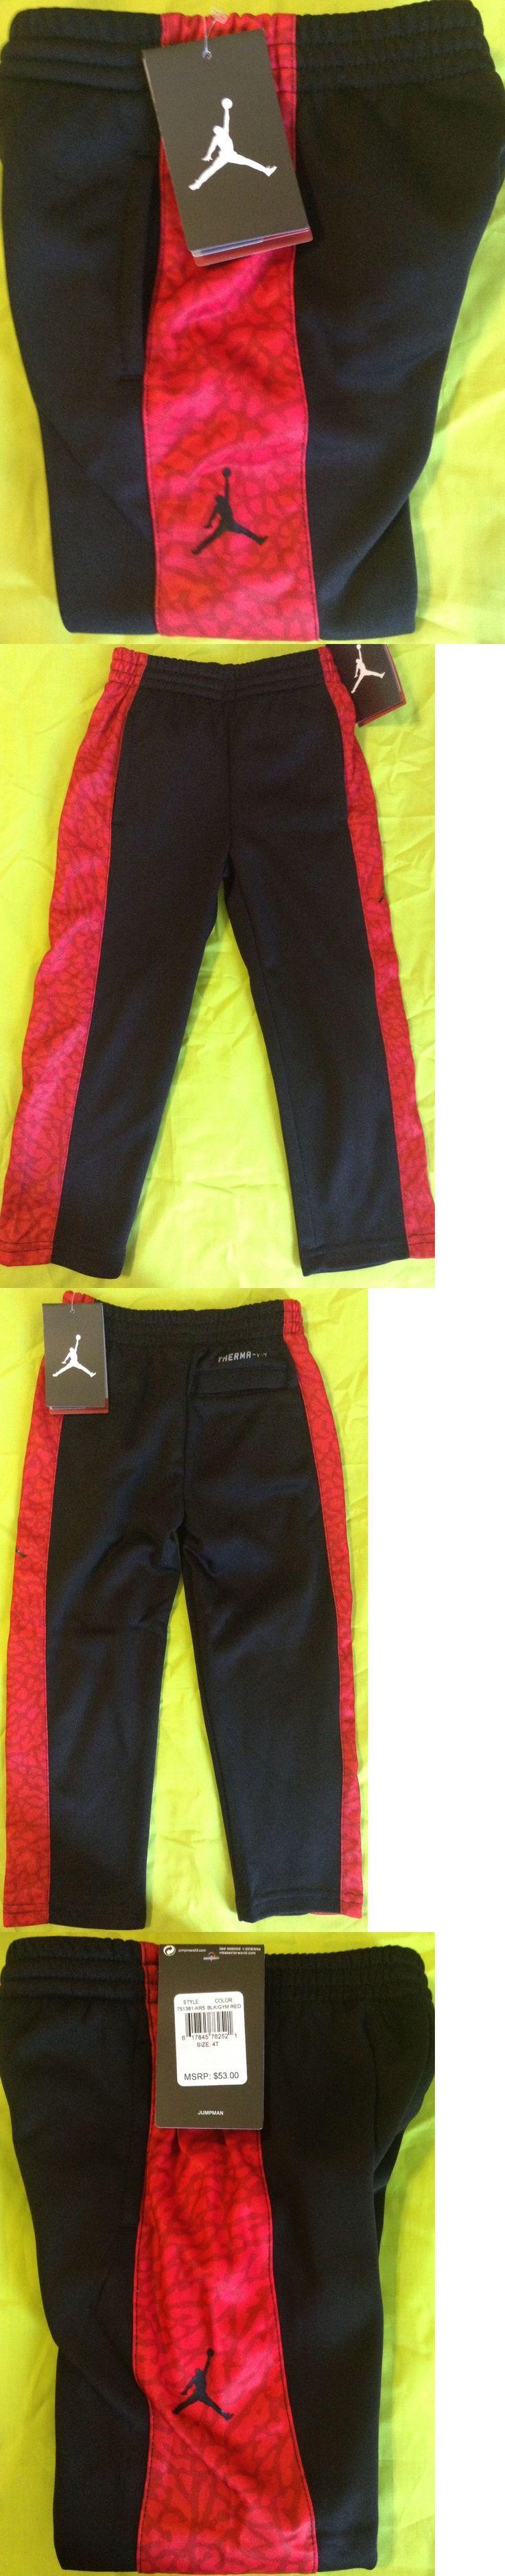 Michael Jordan Baby Clothing: Boys Nwt Michael Jordan Sweat Pants W Pockets Med Red Black $53 -> BUY IT NOW ONLY: $22.99 on eBay!